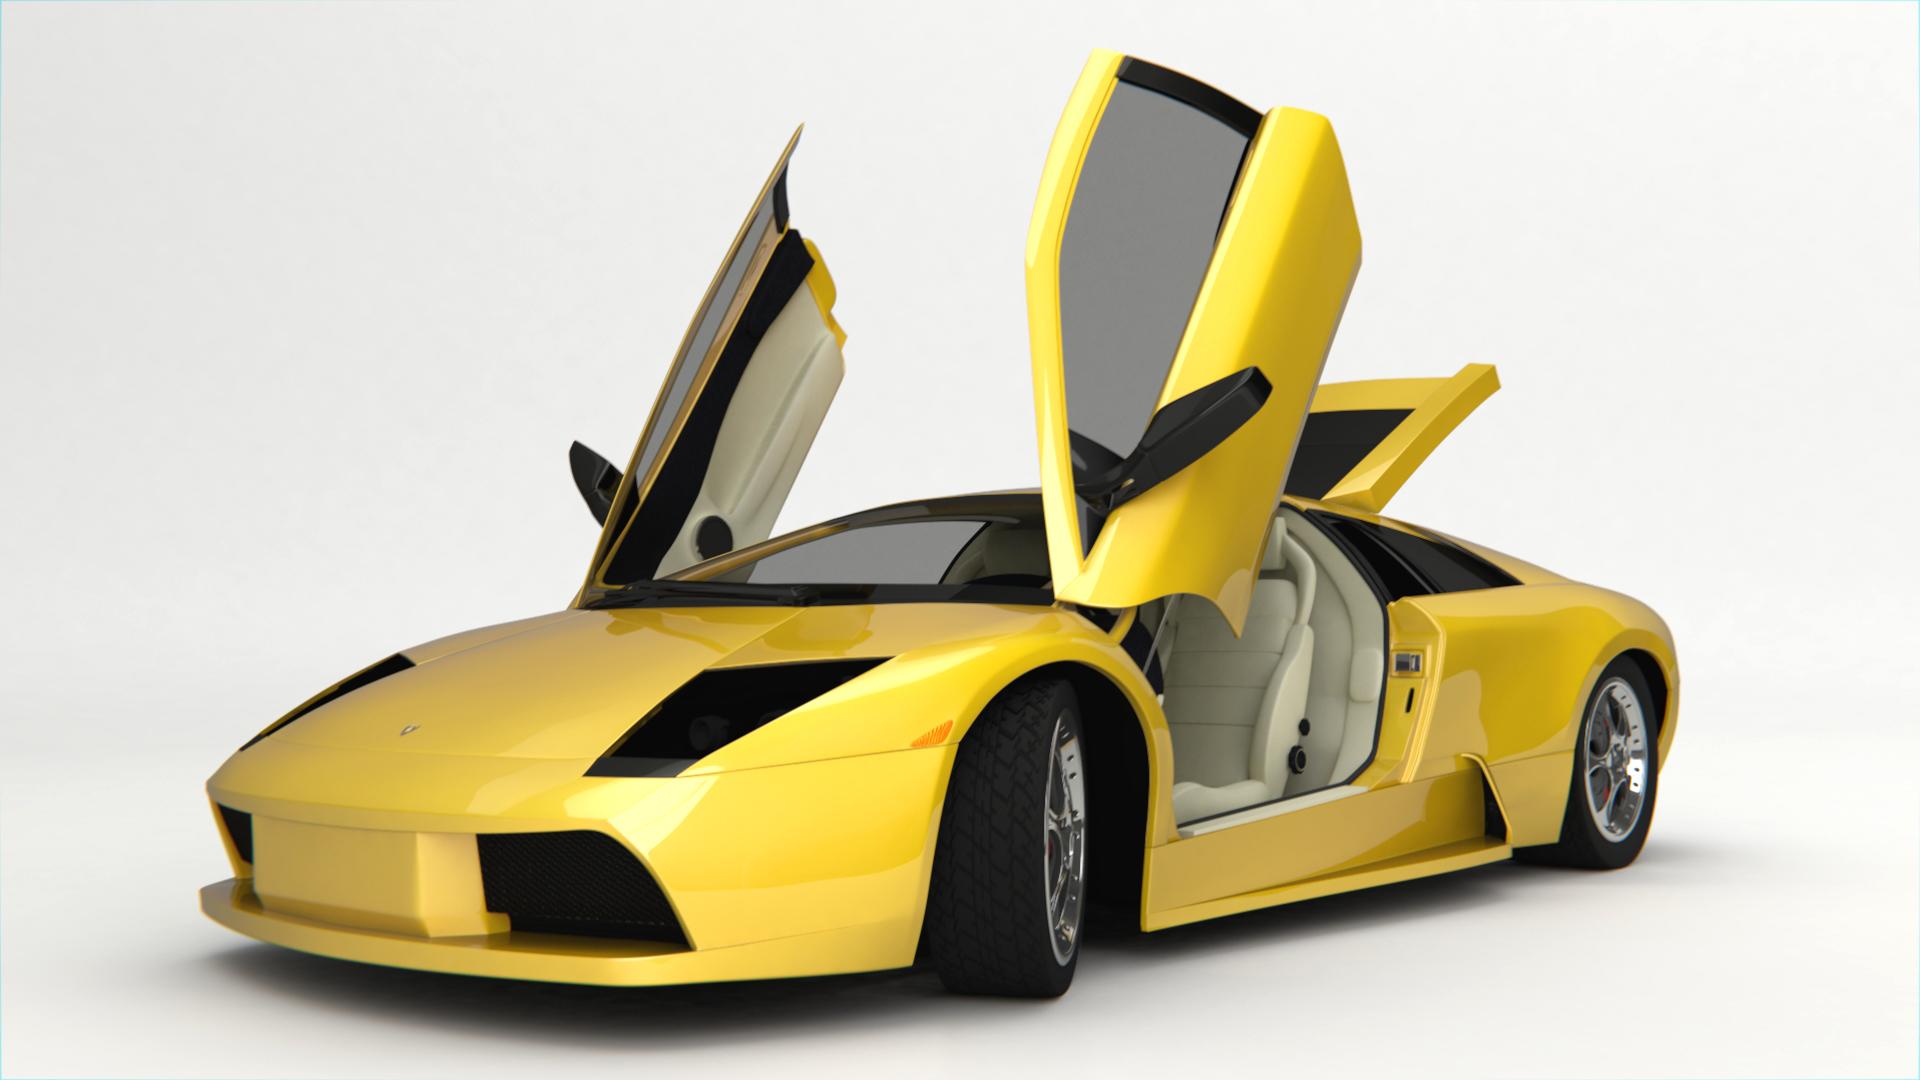 Lamborghini_Murcielago_Render_Front_View.jpg